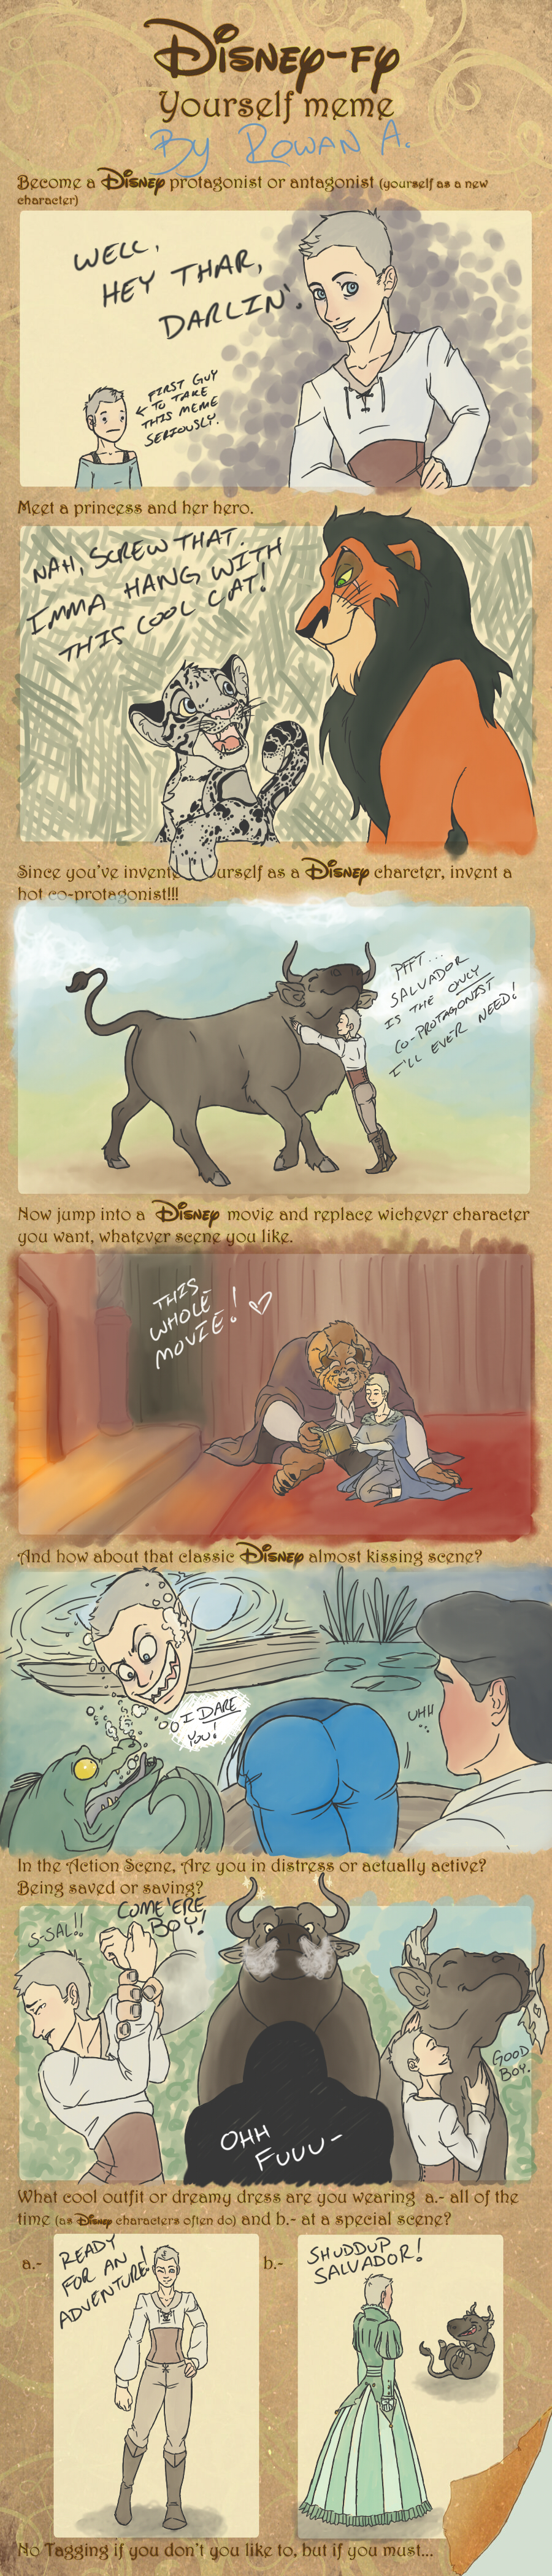 Disney-Fy Meme by Hyperactive-Neko